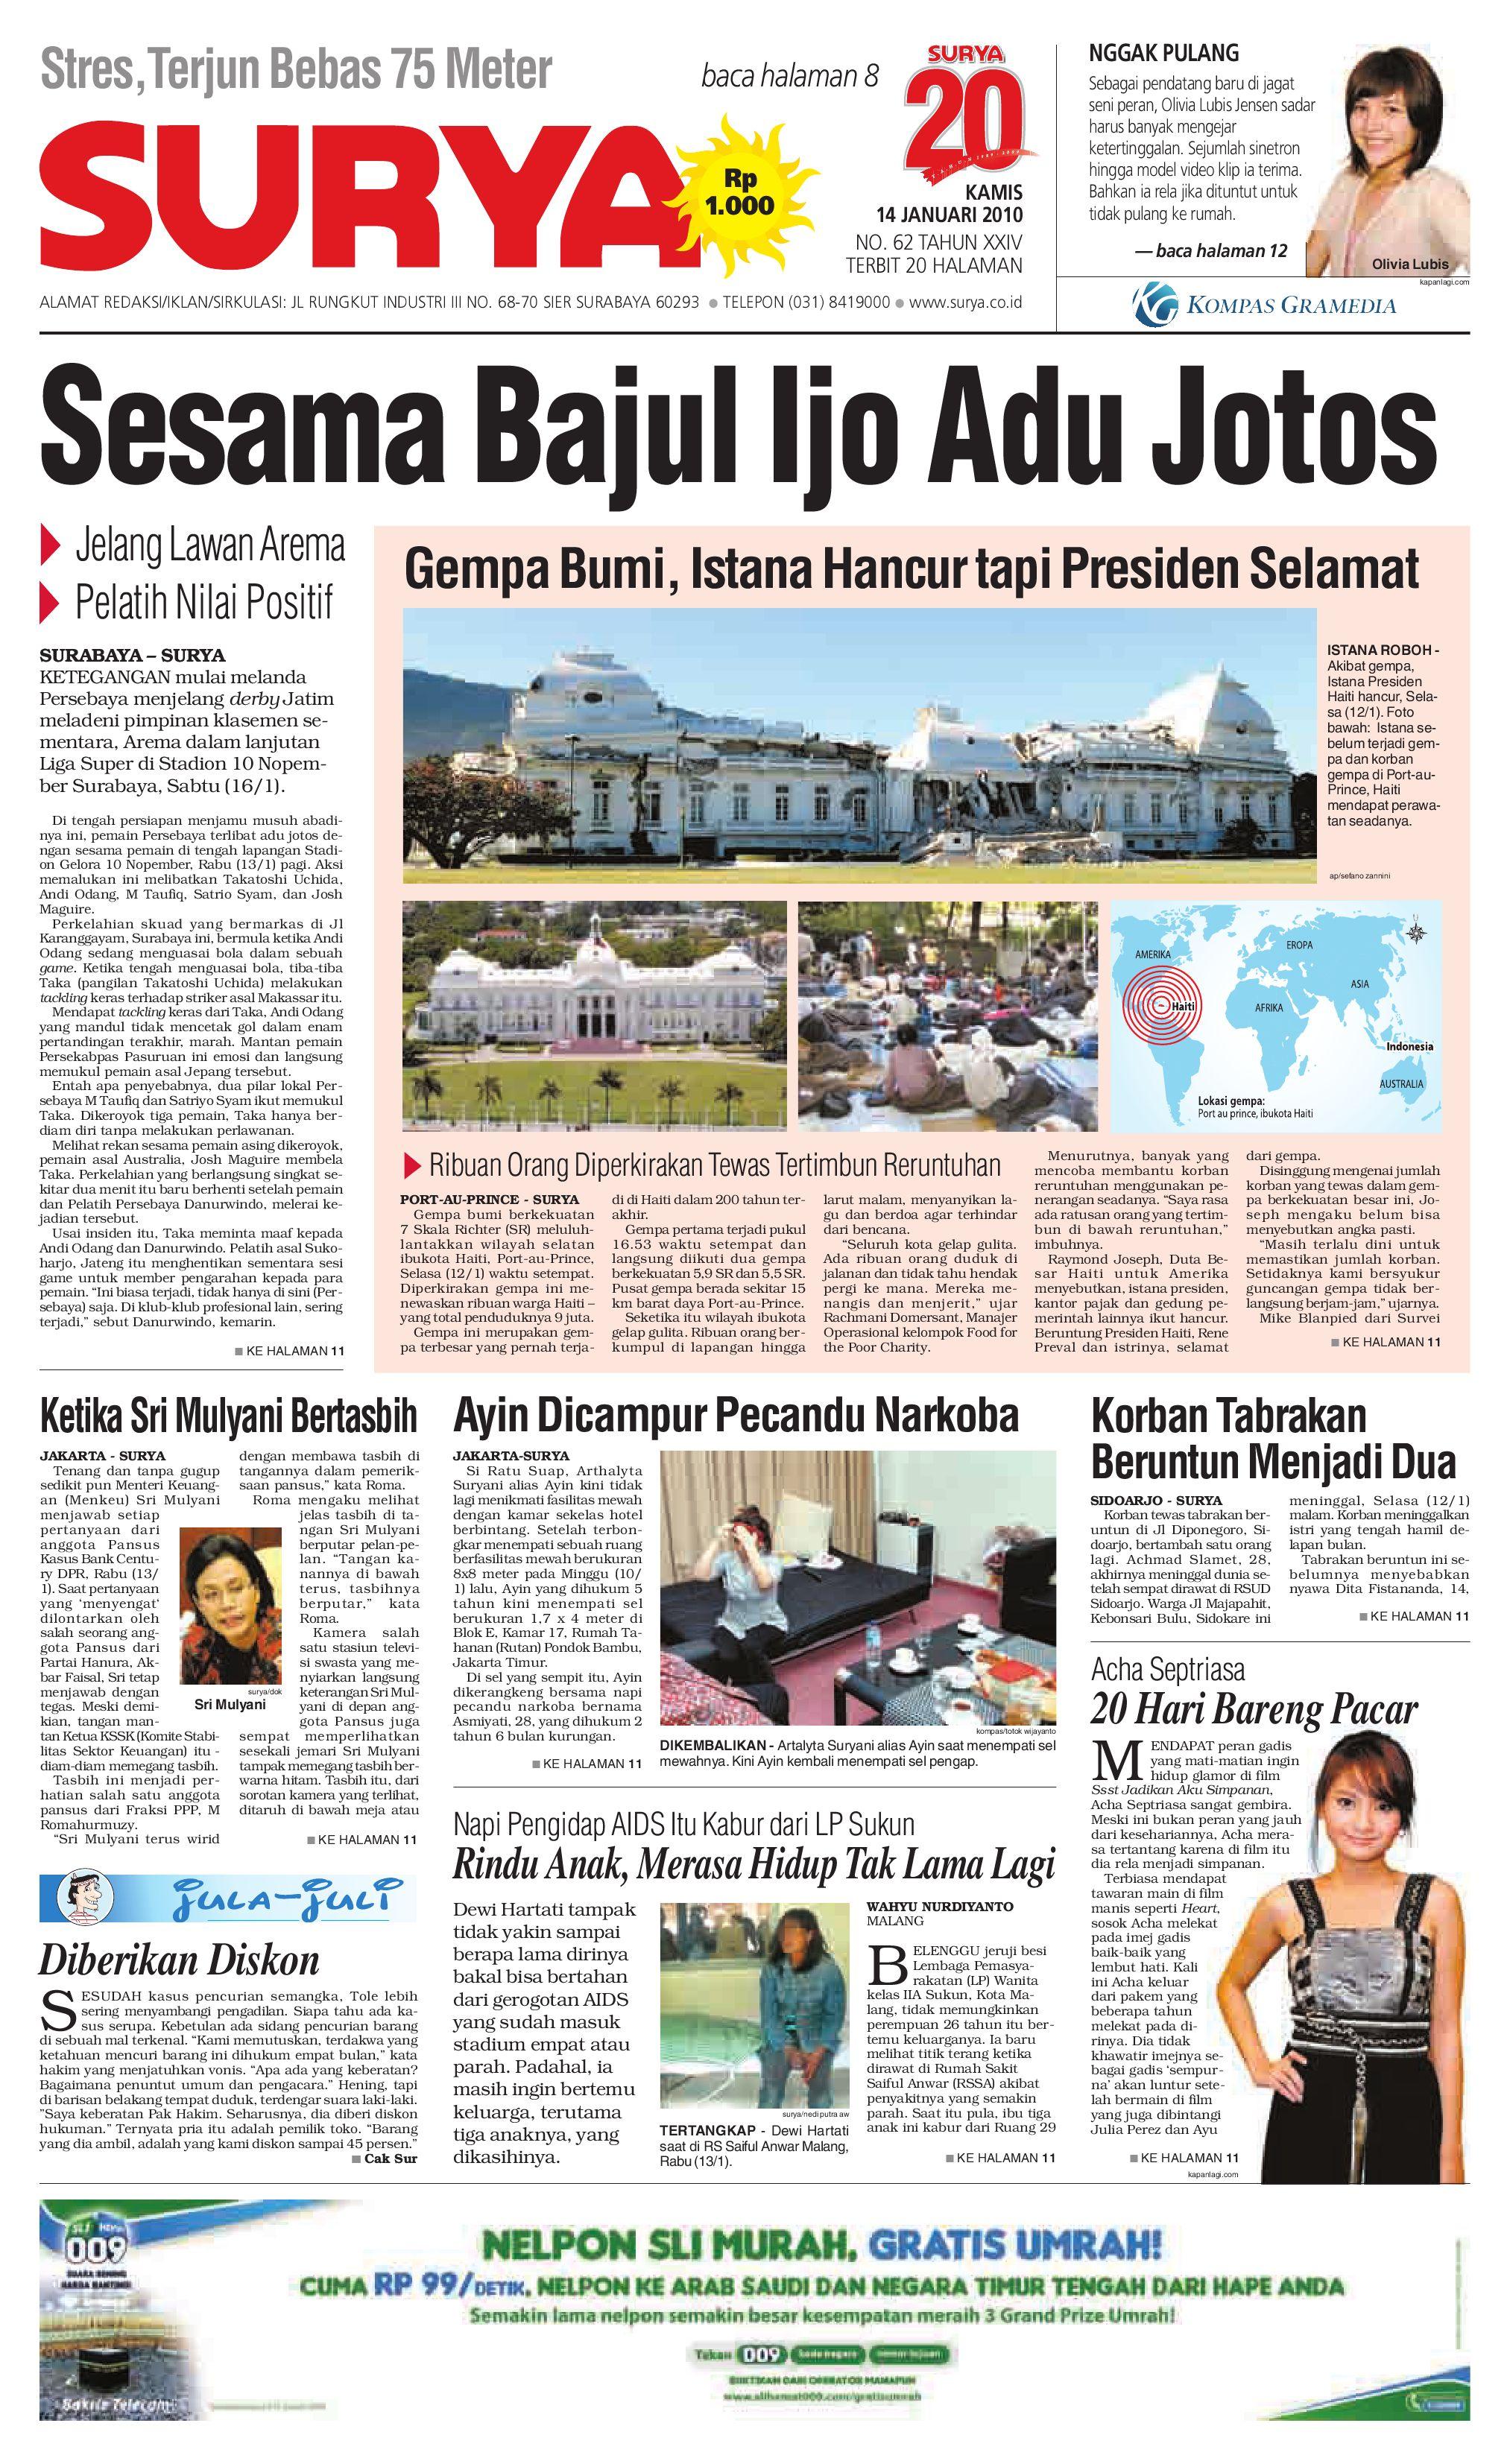 surya edisi cetak 02 nov 2009 by harian surya issuu